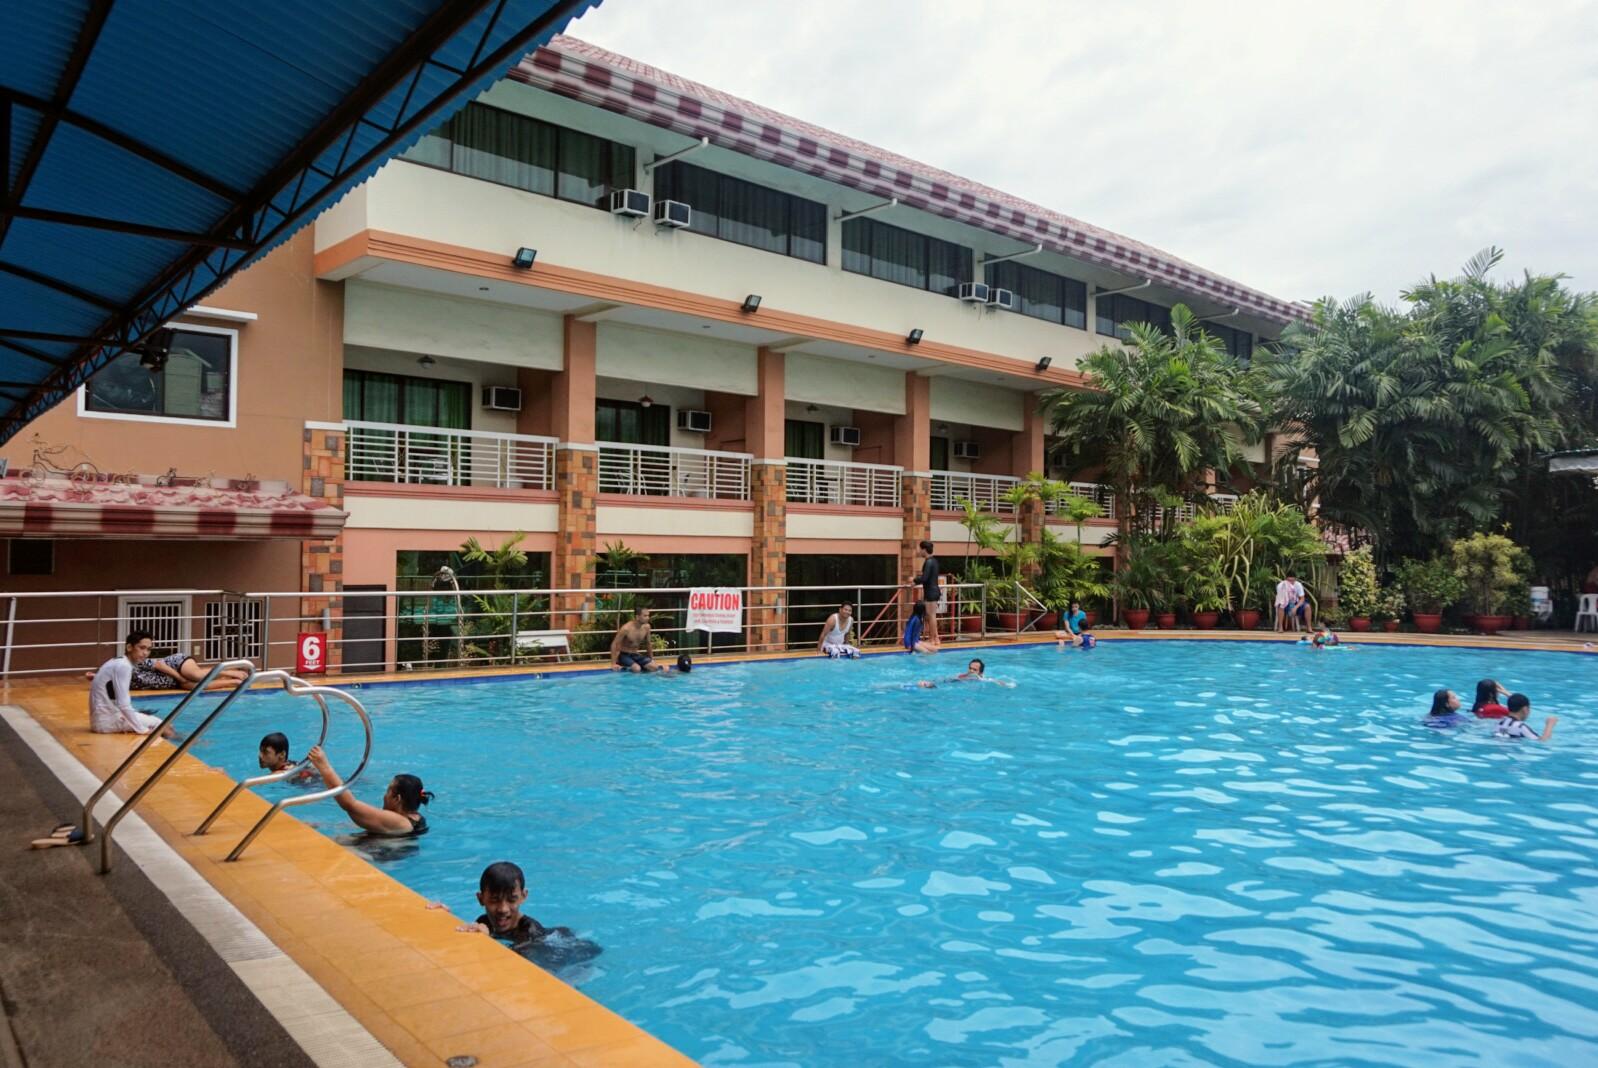 https://tourism.davaocity.gov.ph/wp-content/uploads/2018/10/ea39bc_6738f4c9d45e4c66b955a736408a1c9e_mv2.jpg